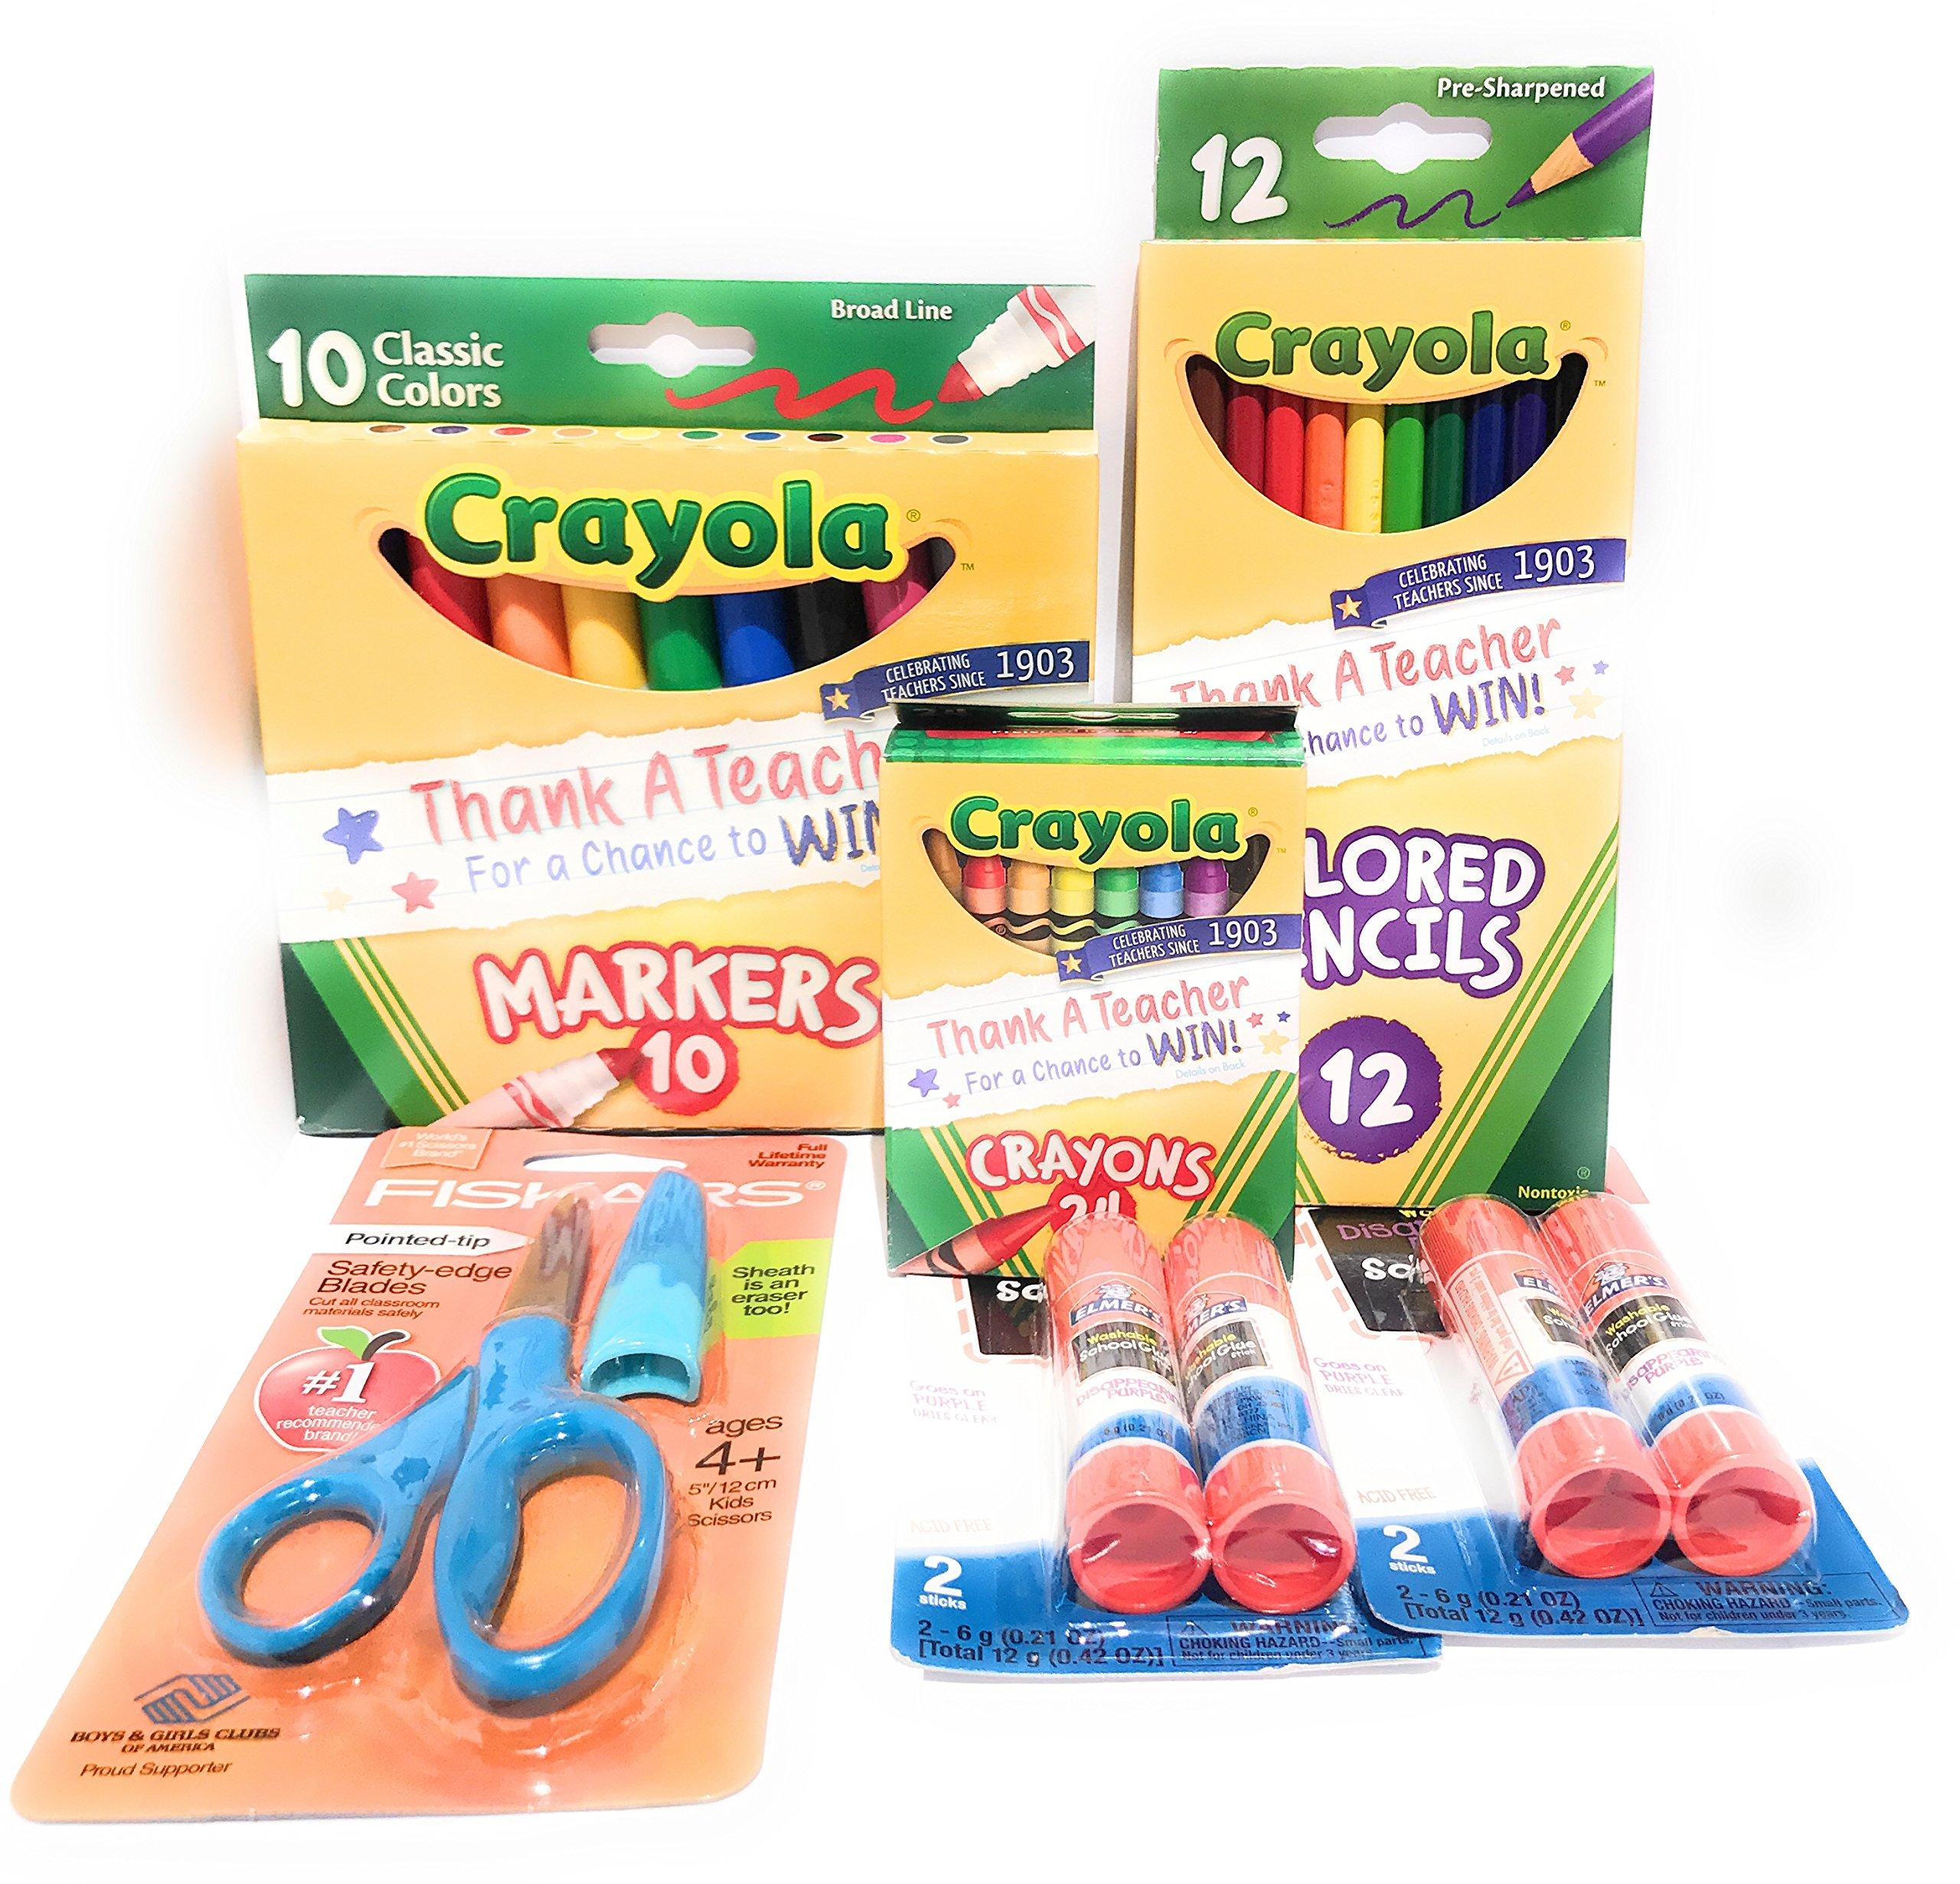 School Supplies Bundle - Blue Fiskars Pointed-tip Scissors, Crayola Markers, Colored Pencils and Crayons, Glue Sticks Bundle